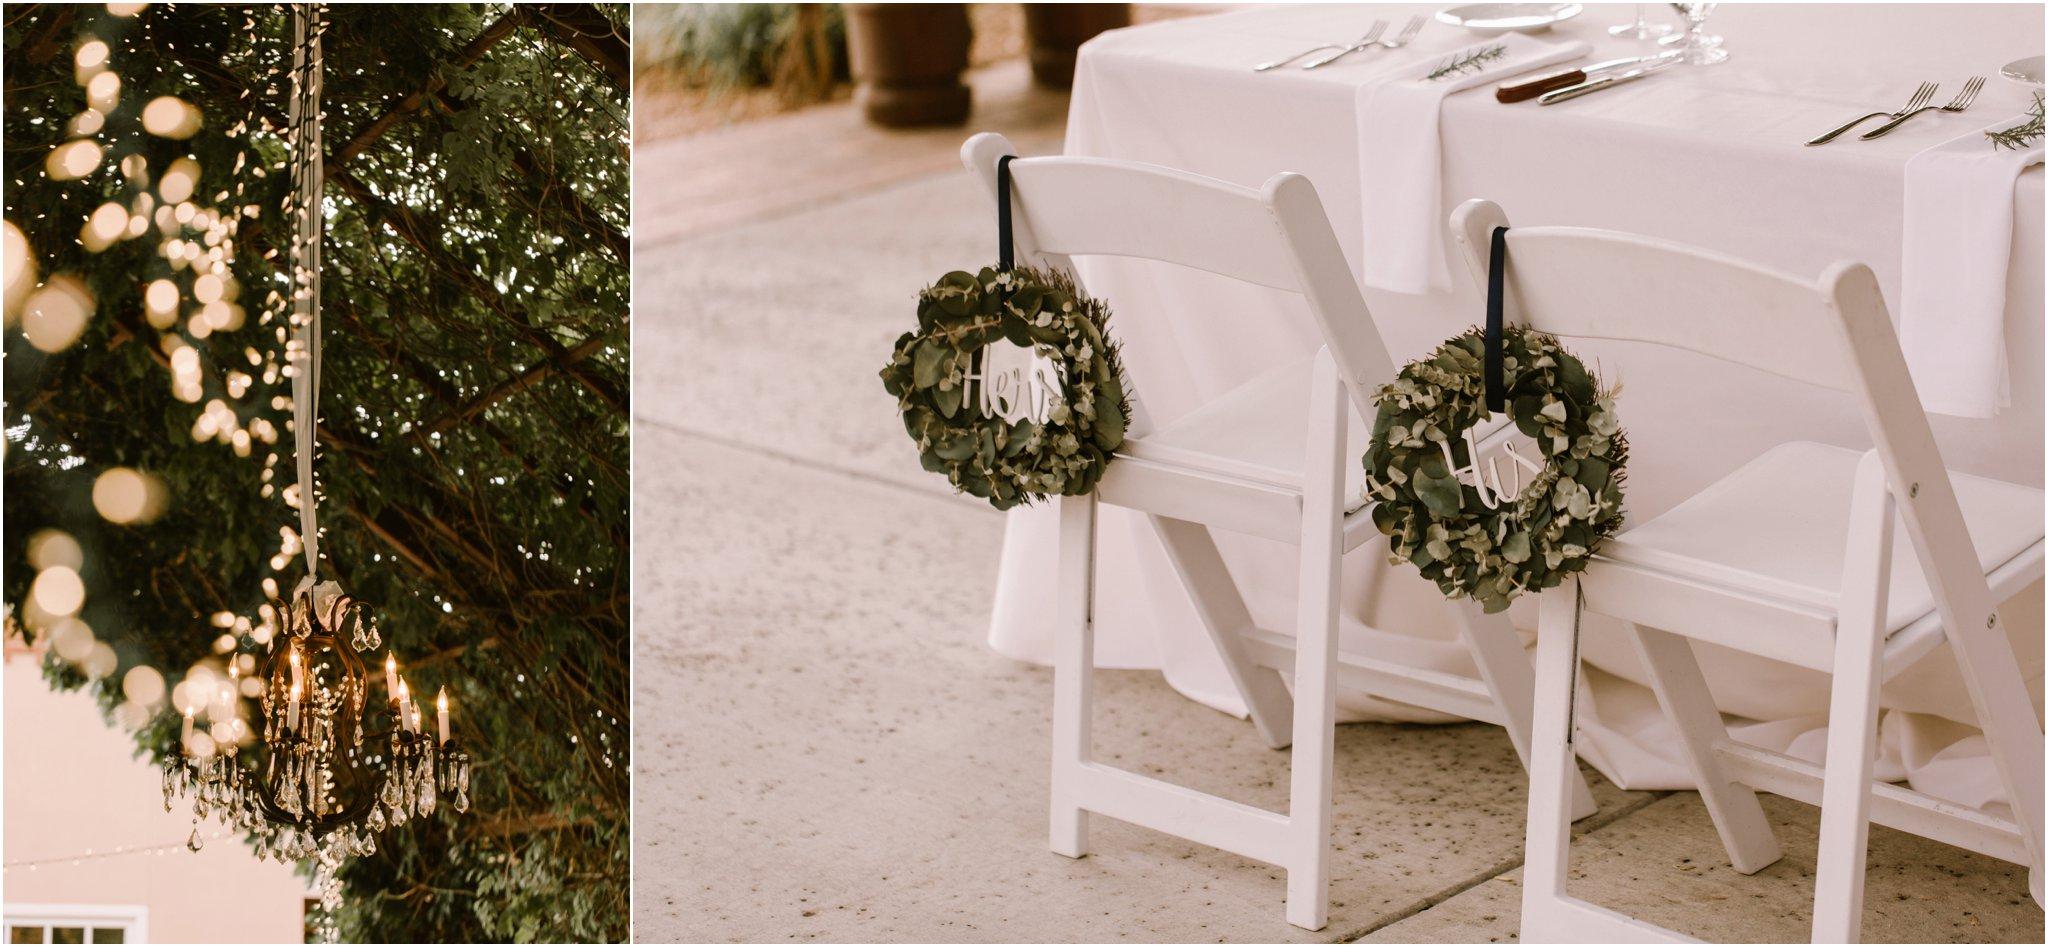 0031Hotel Albuquerque Wedding, Inn and Spa at Loretto wedding, Santa Fe wedding photographers, blue rose photography